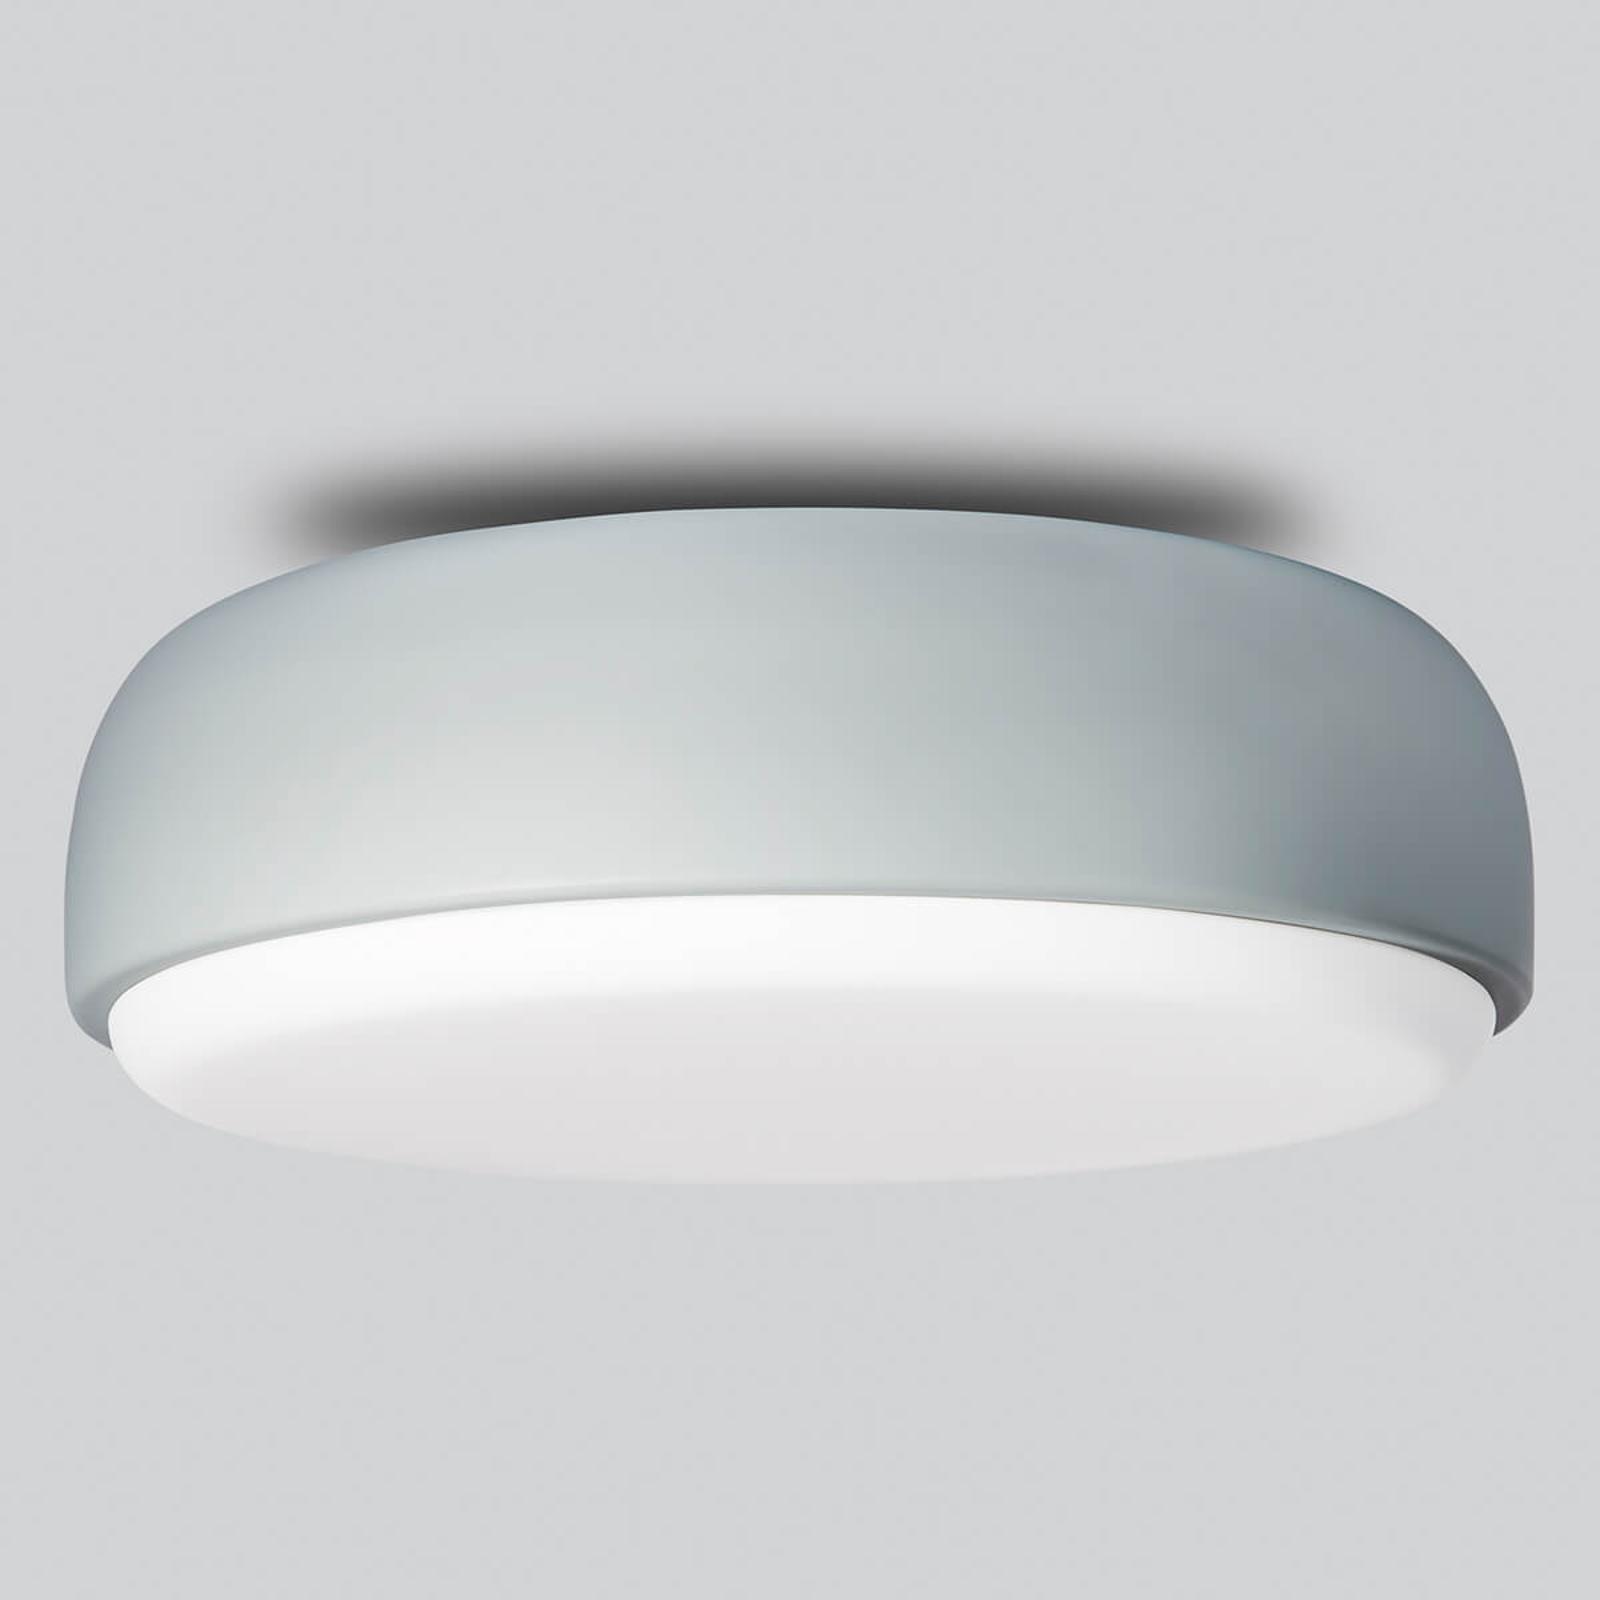 Uniwersalna lampa sufitowa Over Me, 40 cm